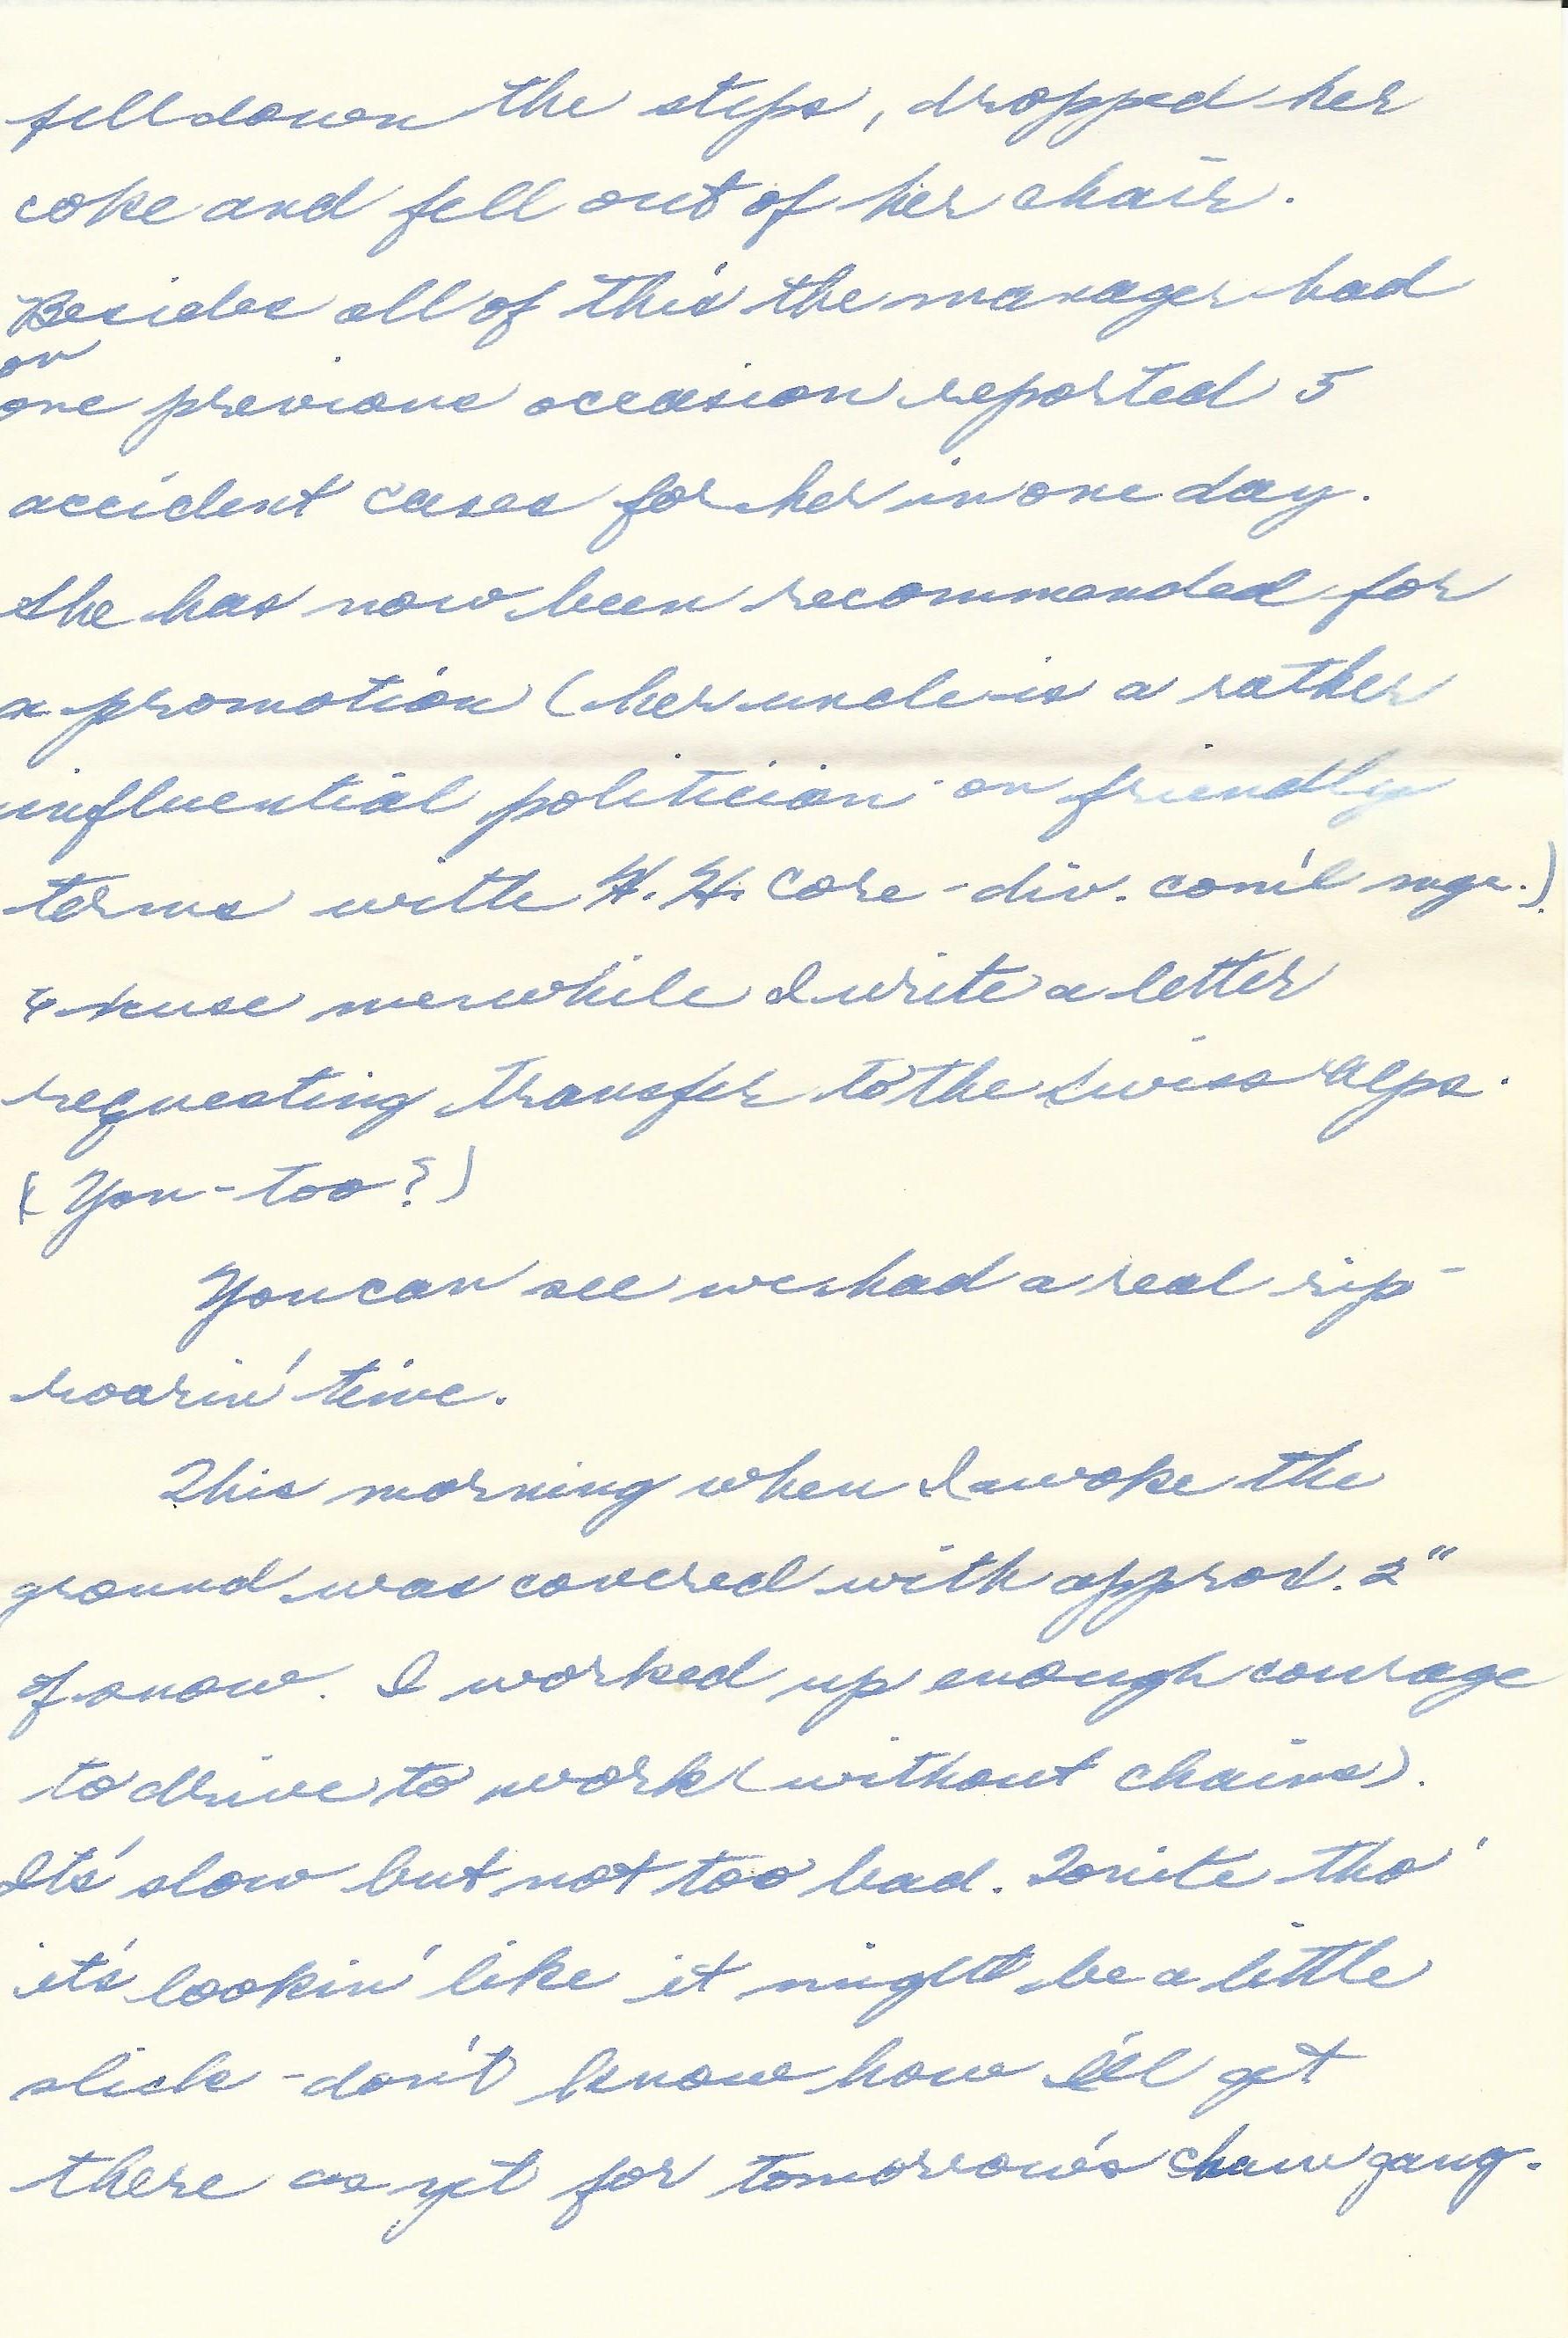 2. Jan. 5, 1953 (Oma)_Page_04.jpg